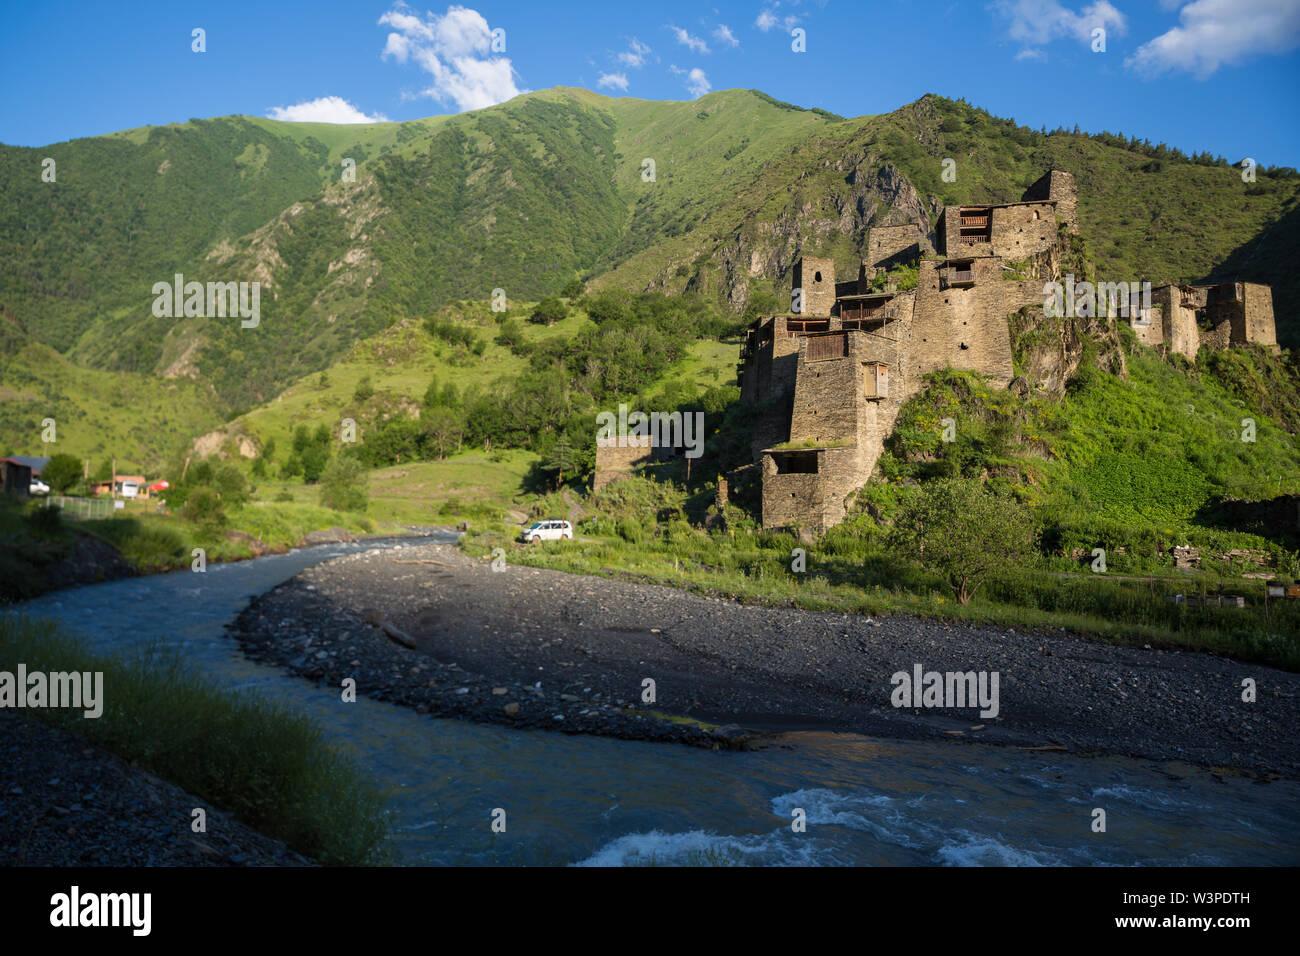 Shatili medieval fortress in Khevsureti. Nothern Georgia - Stock Image